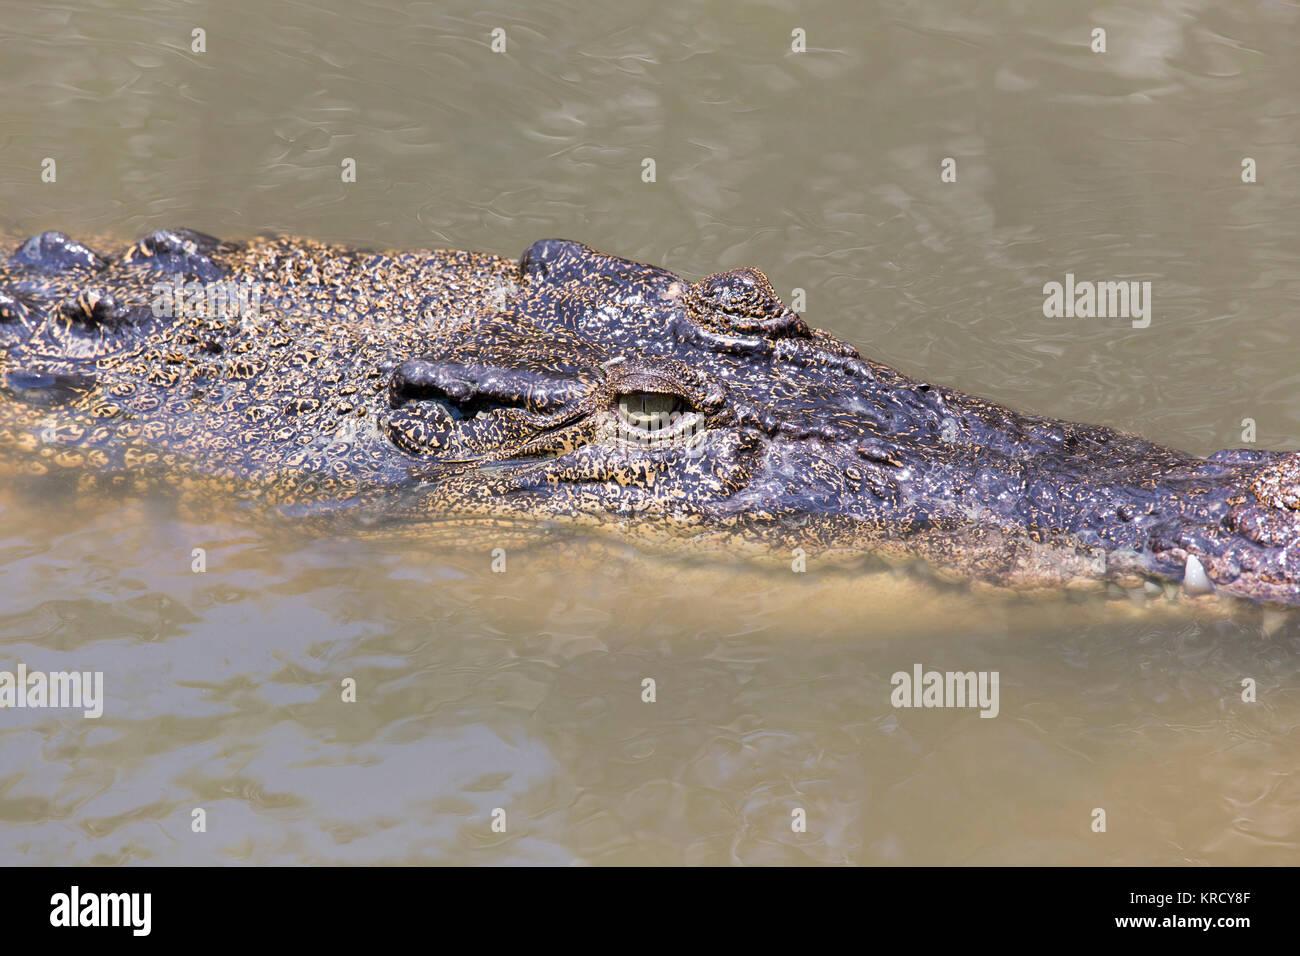 Crocodile portrait in Vietnam - Stock Image